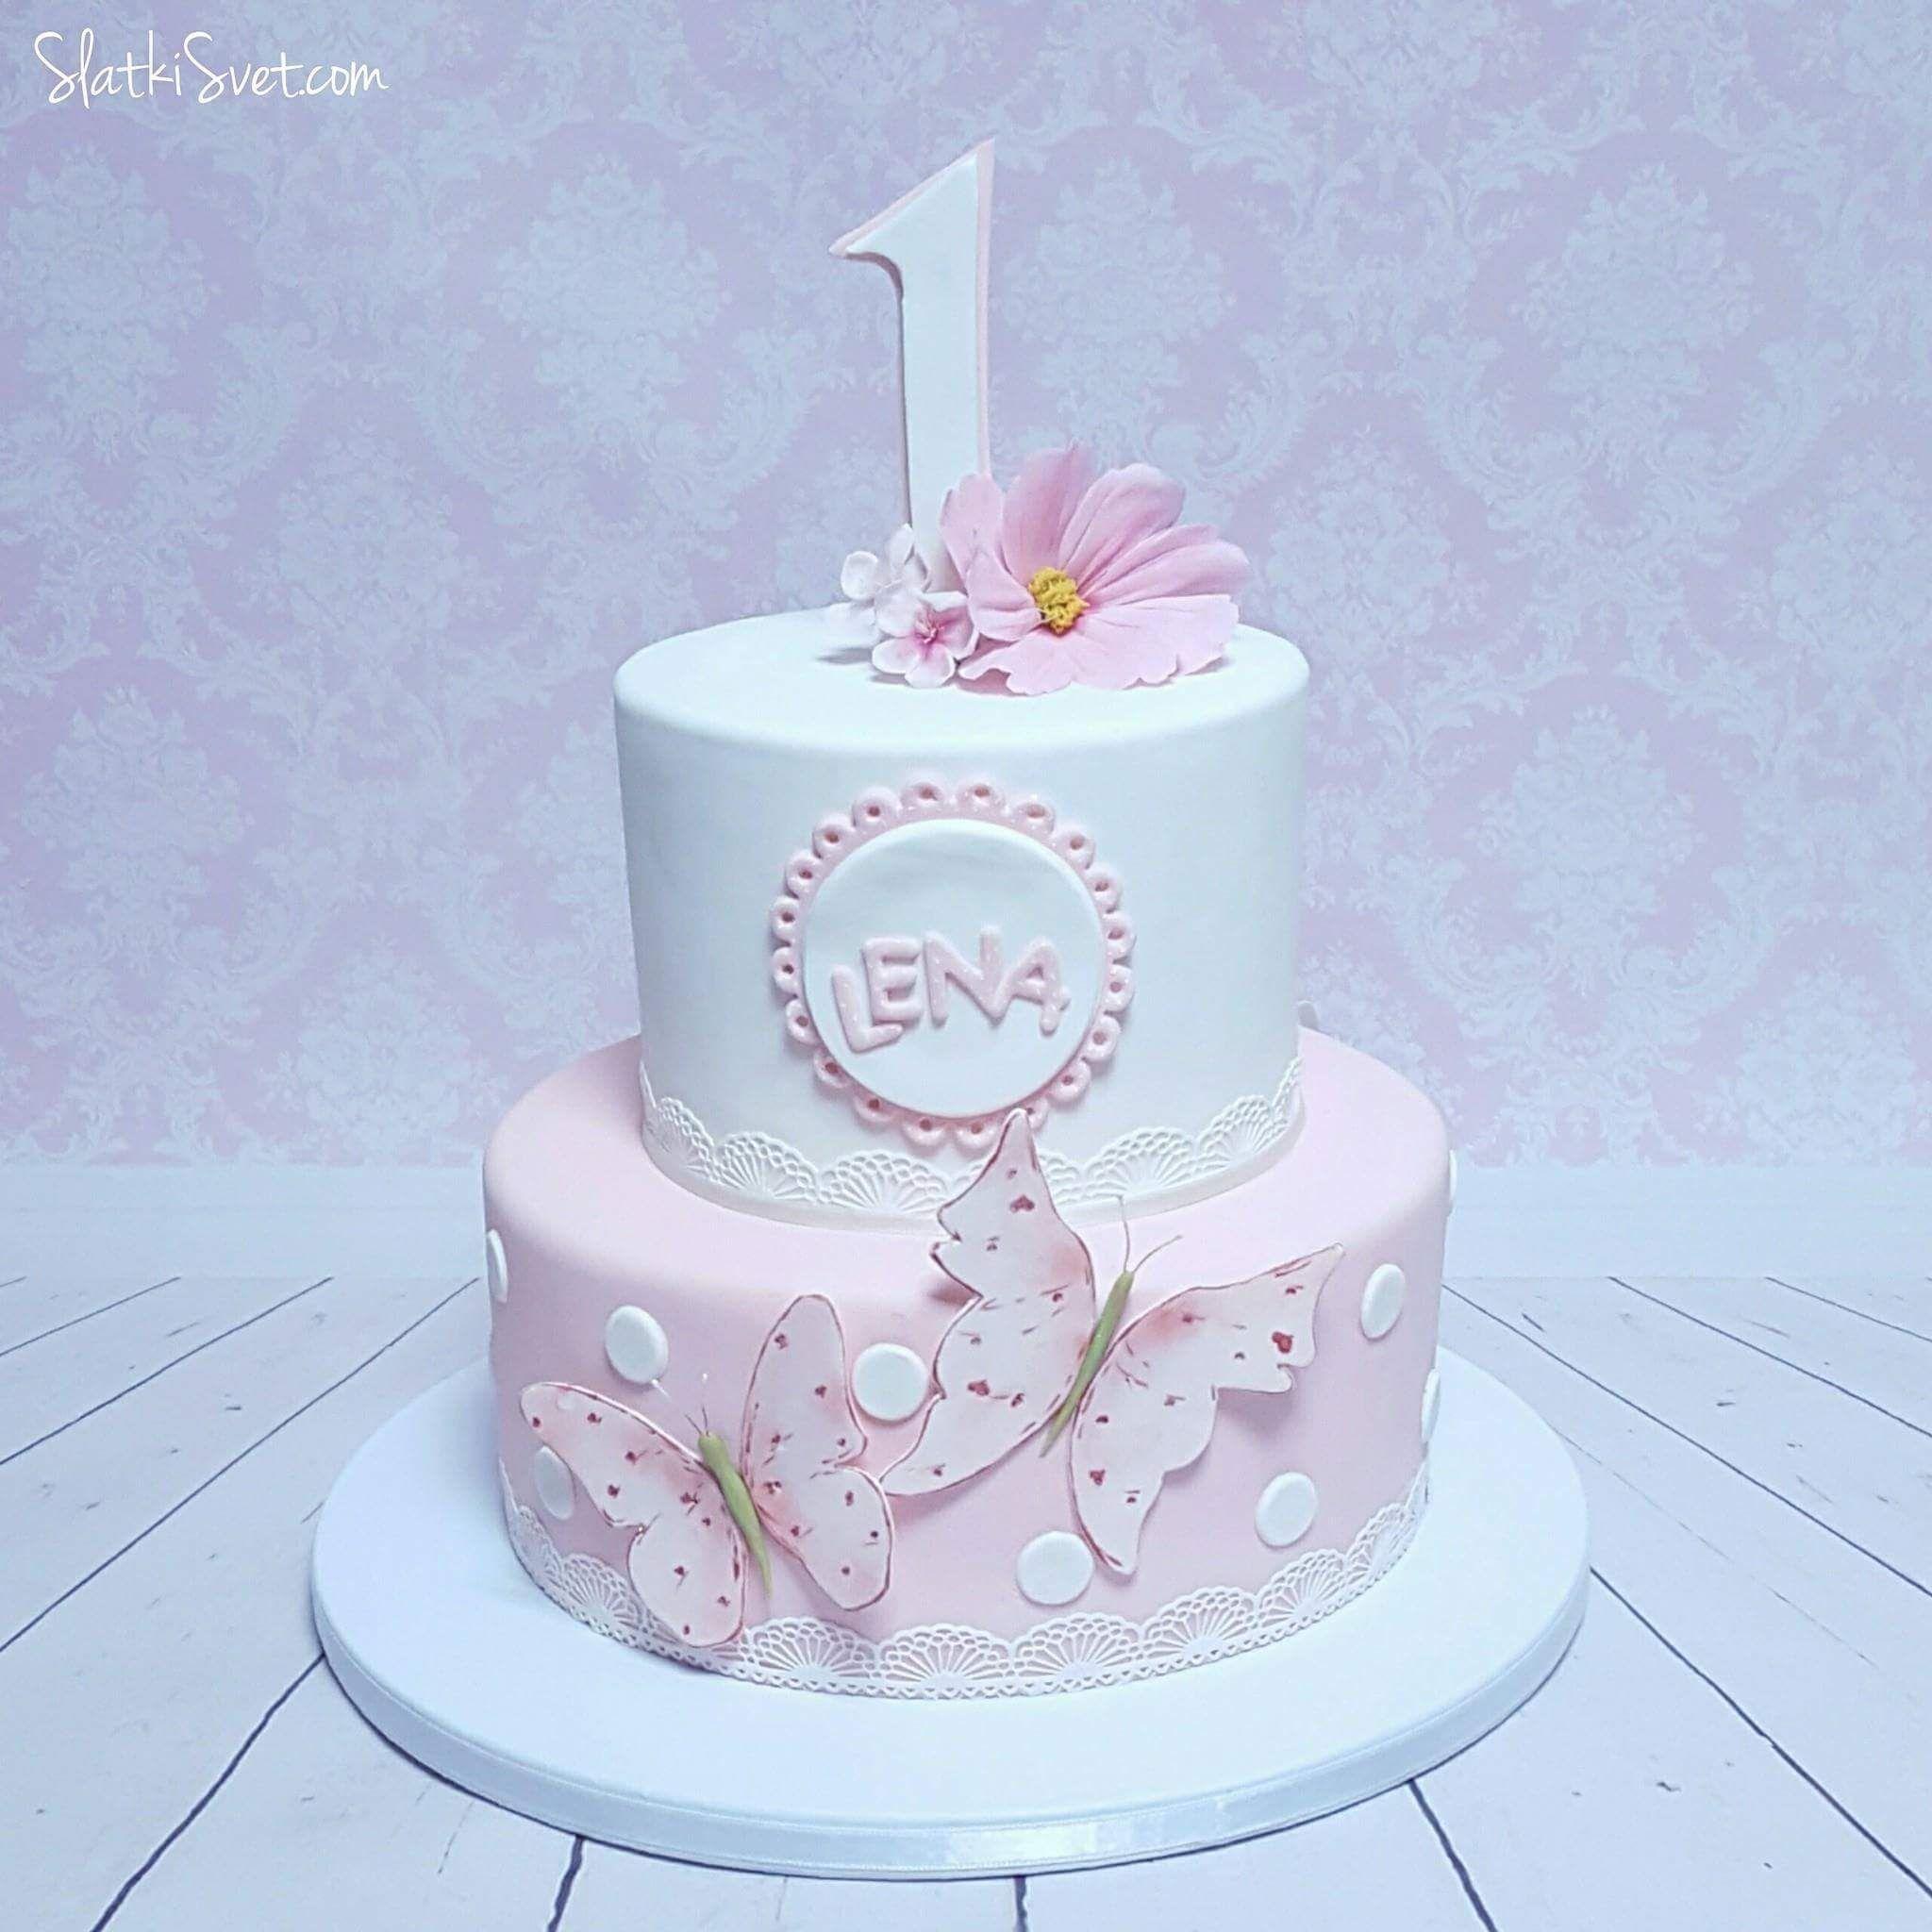 Girl S Birthday Cake Slatkisvet By Vanja Facebook Page